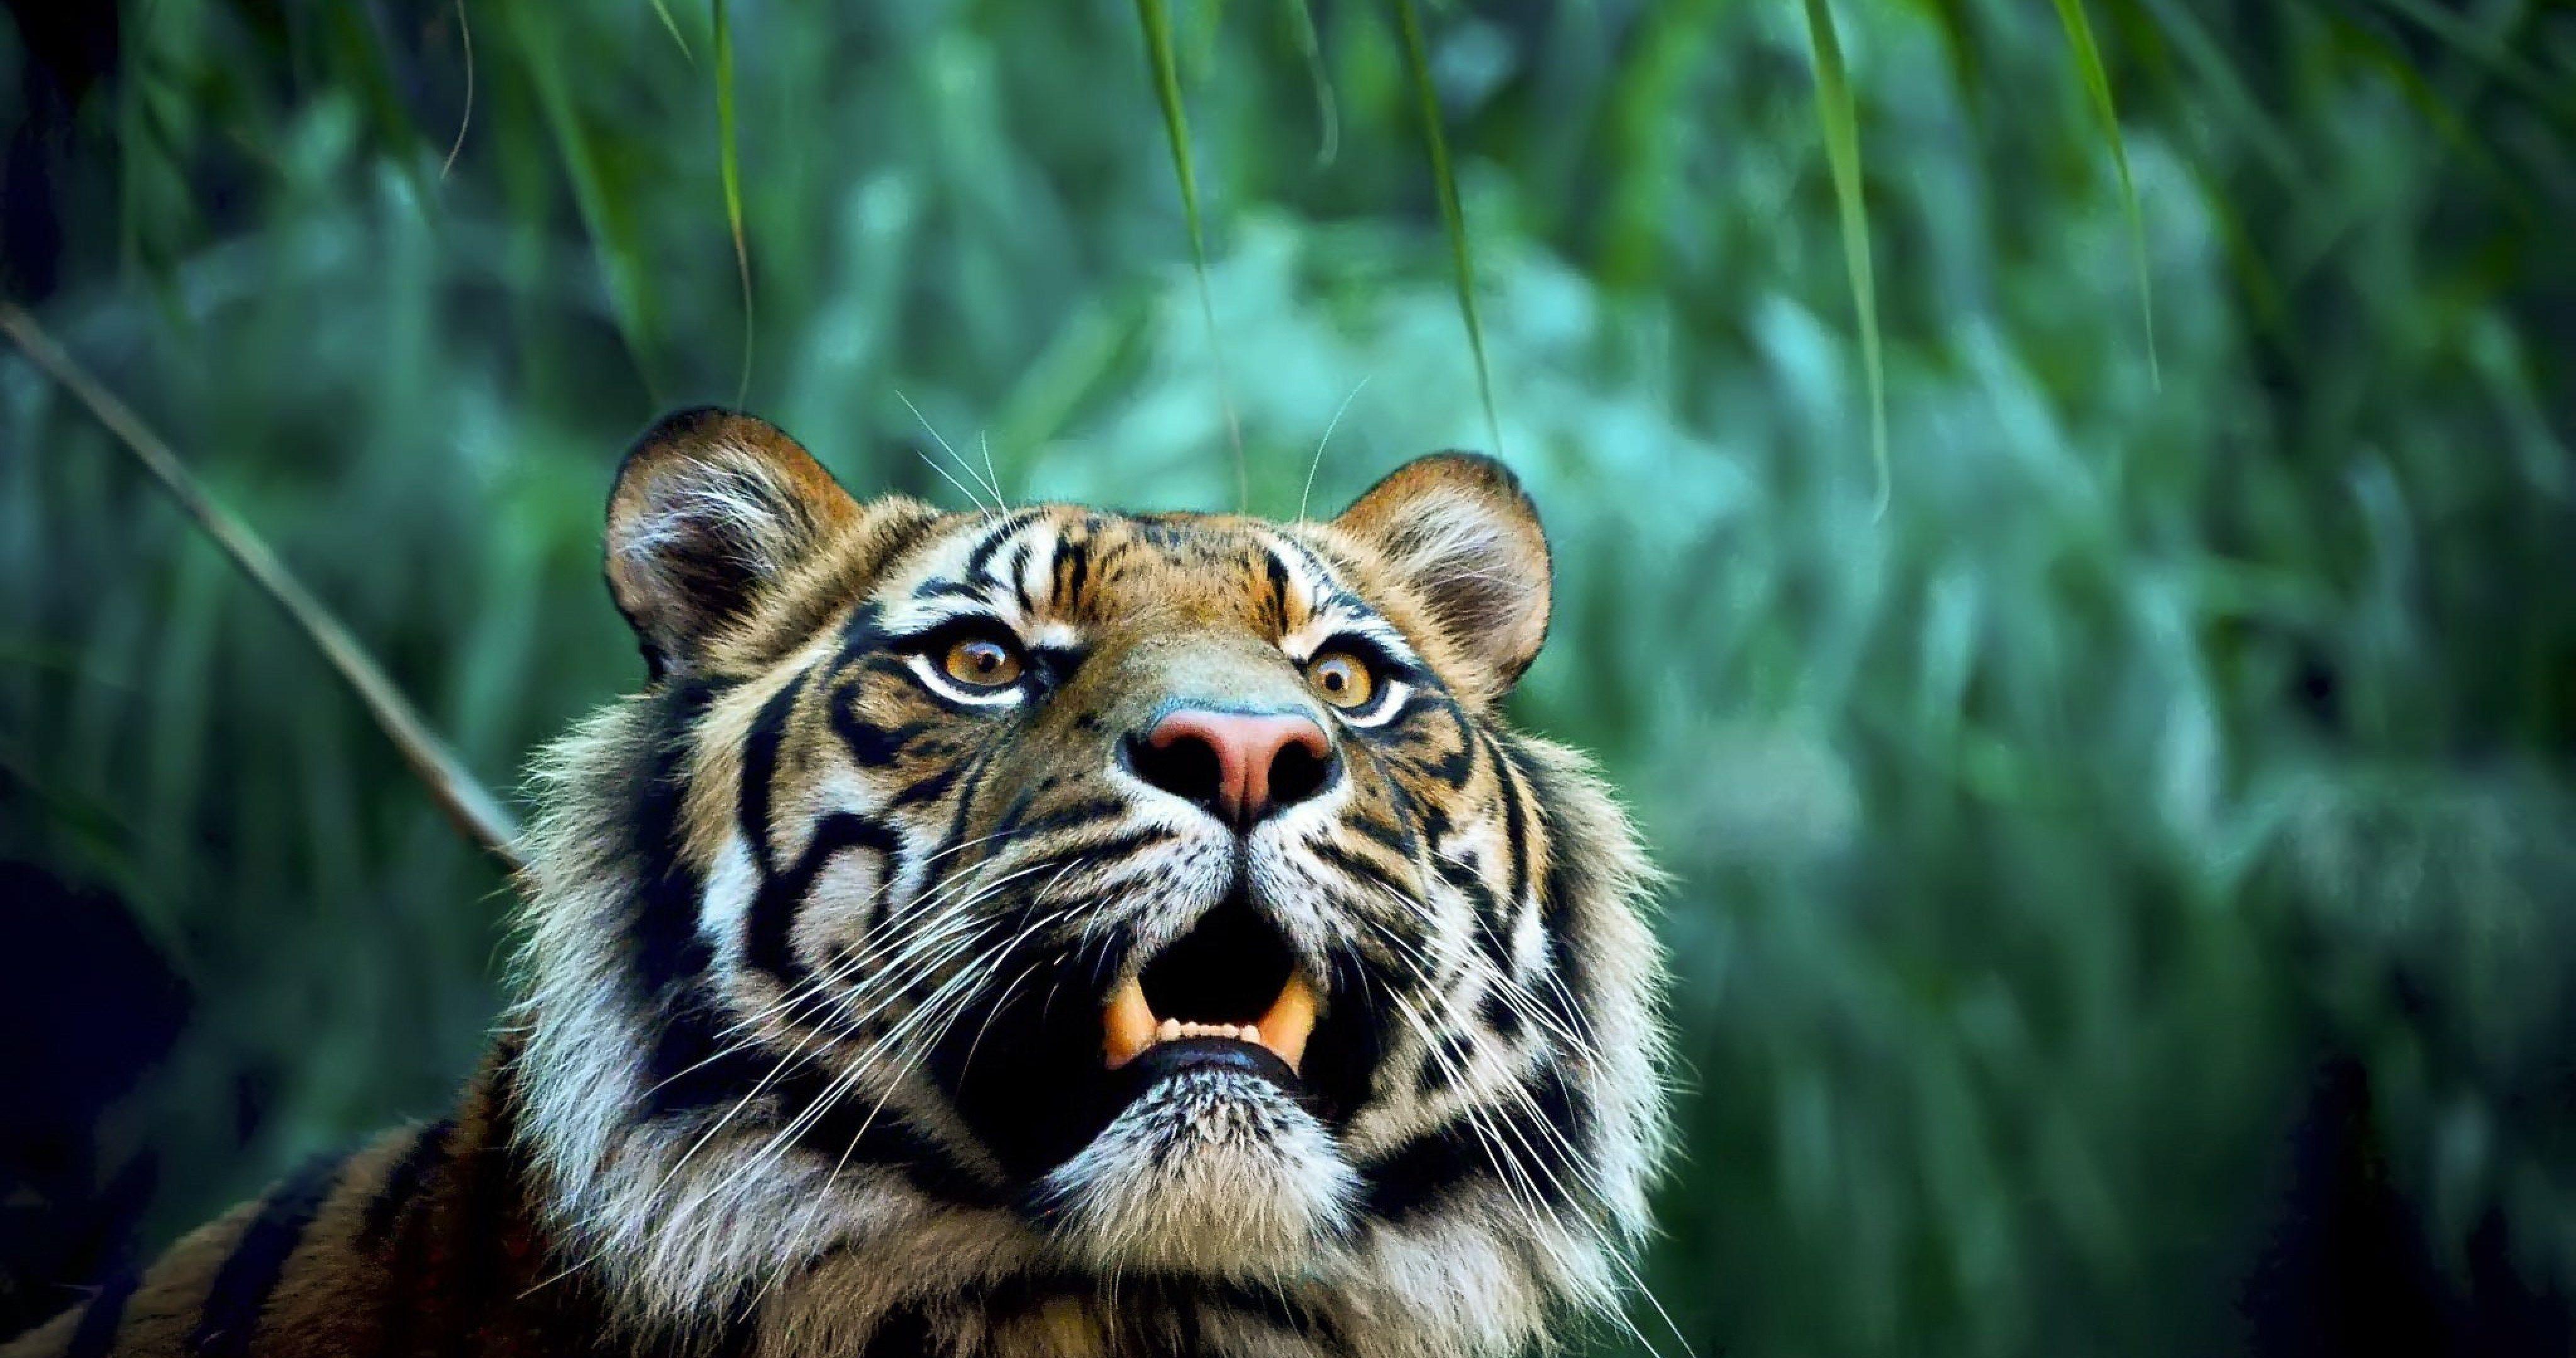 Tiger in jungle 4k ultra hd wallpaper ololoshenka - Ultra hd animal wallpapers ...